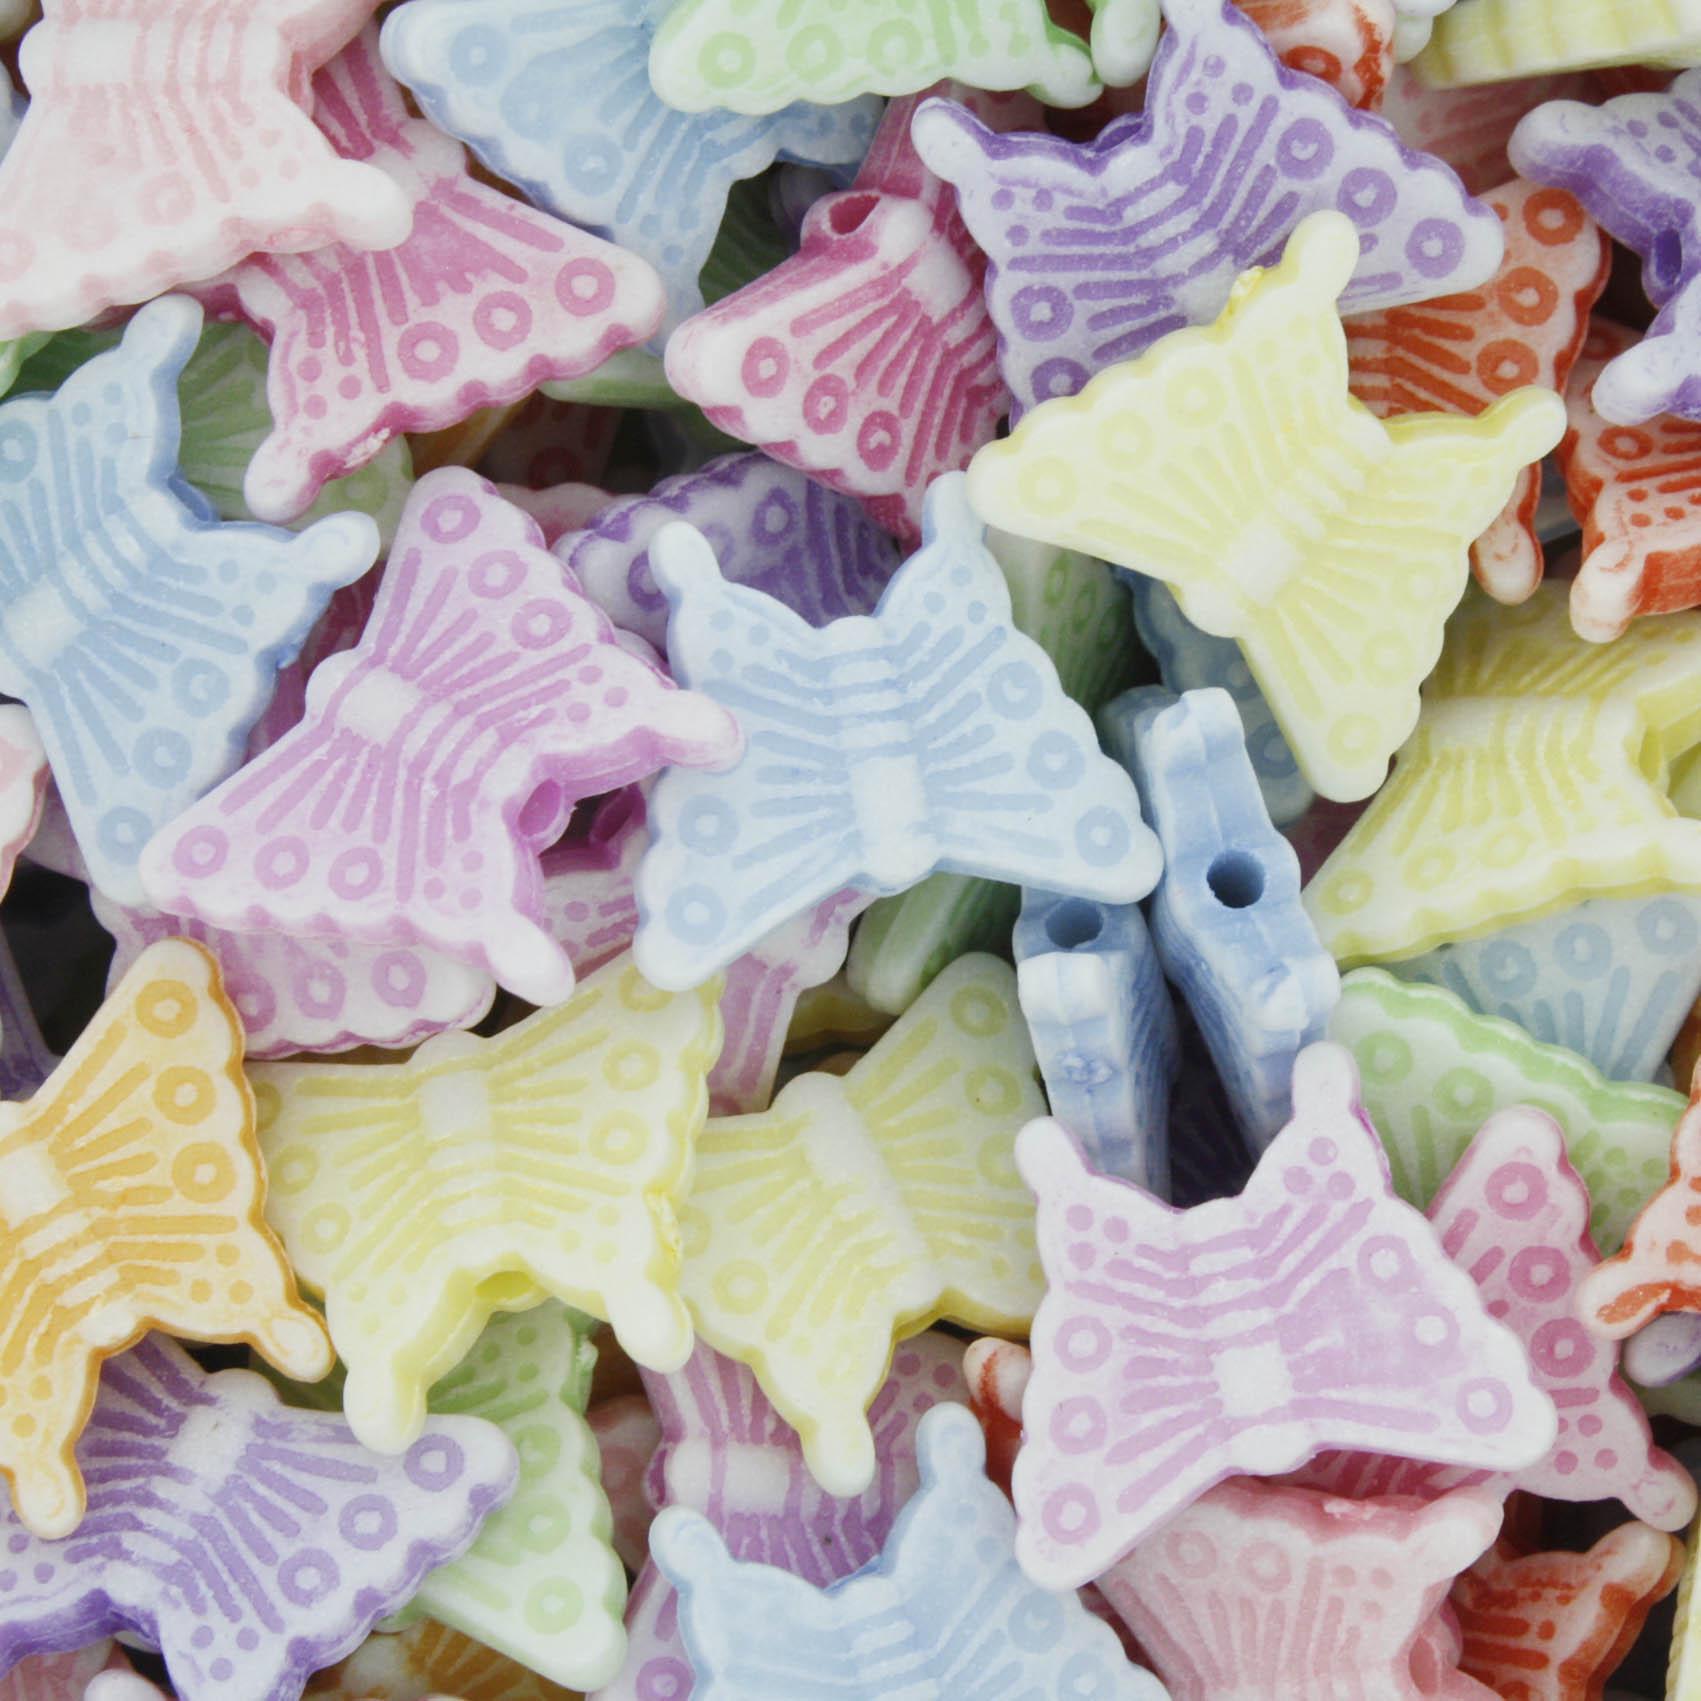 Miçanga Colorida Infantil - Borboletinhas  - Stéphanie Bijoux® - Peças para Bijuterias e Artesanato